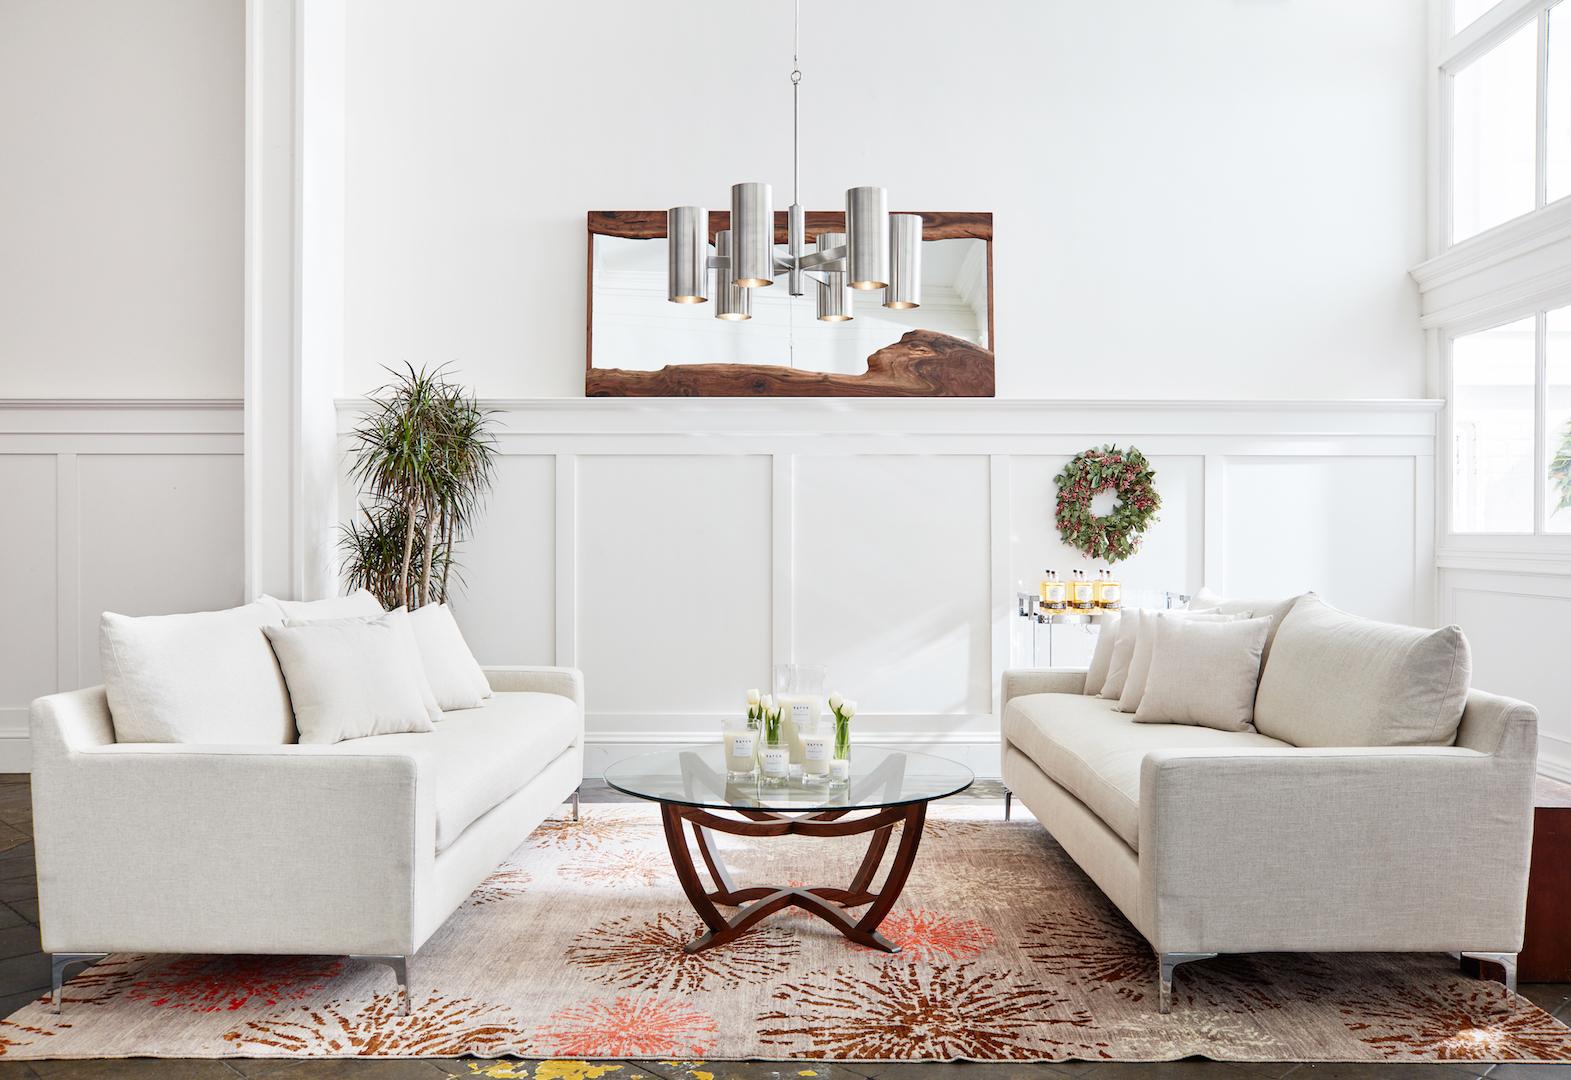 Robert Long Lighting with Interior Define.jpg